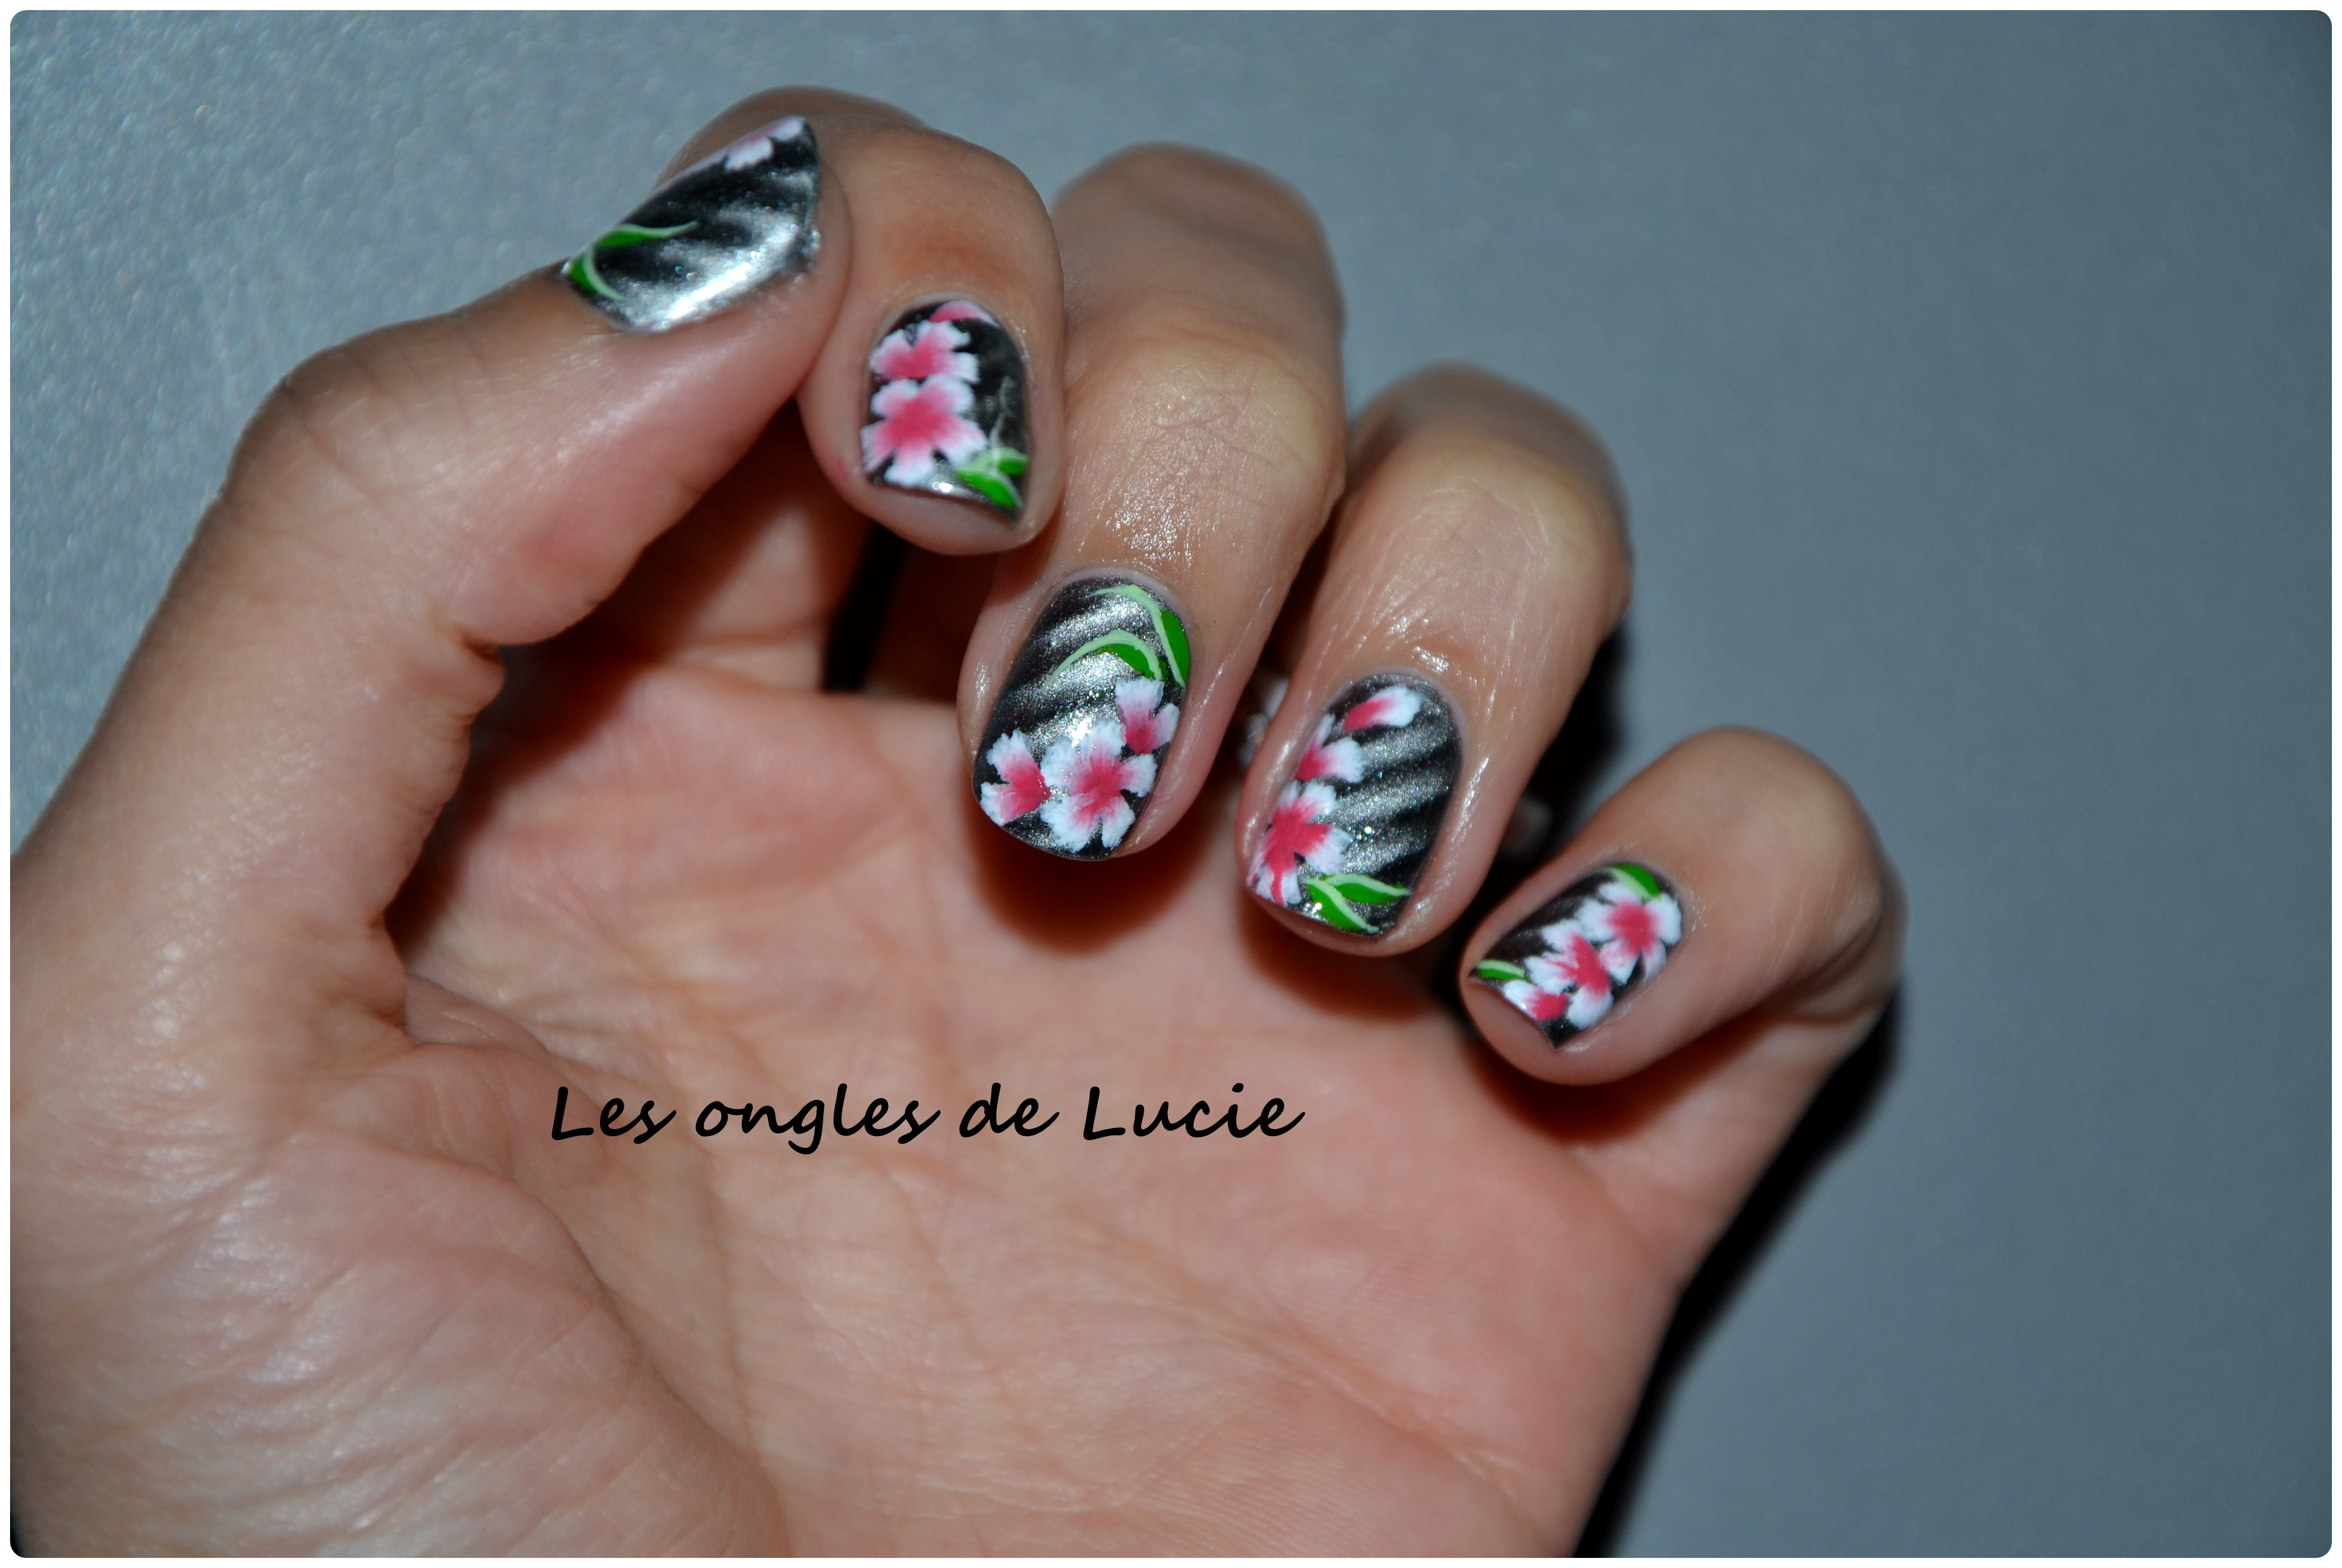 Nail art petites fleurs de printemps les ongles de lucie - Nail art printemps ...